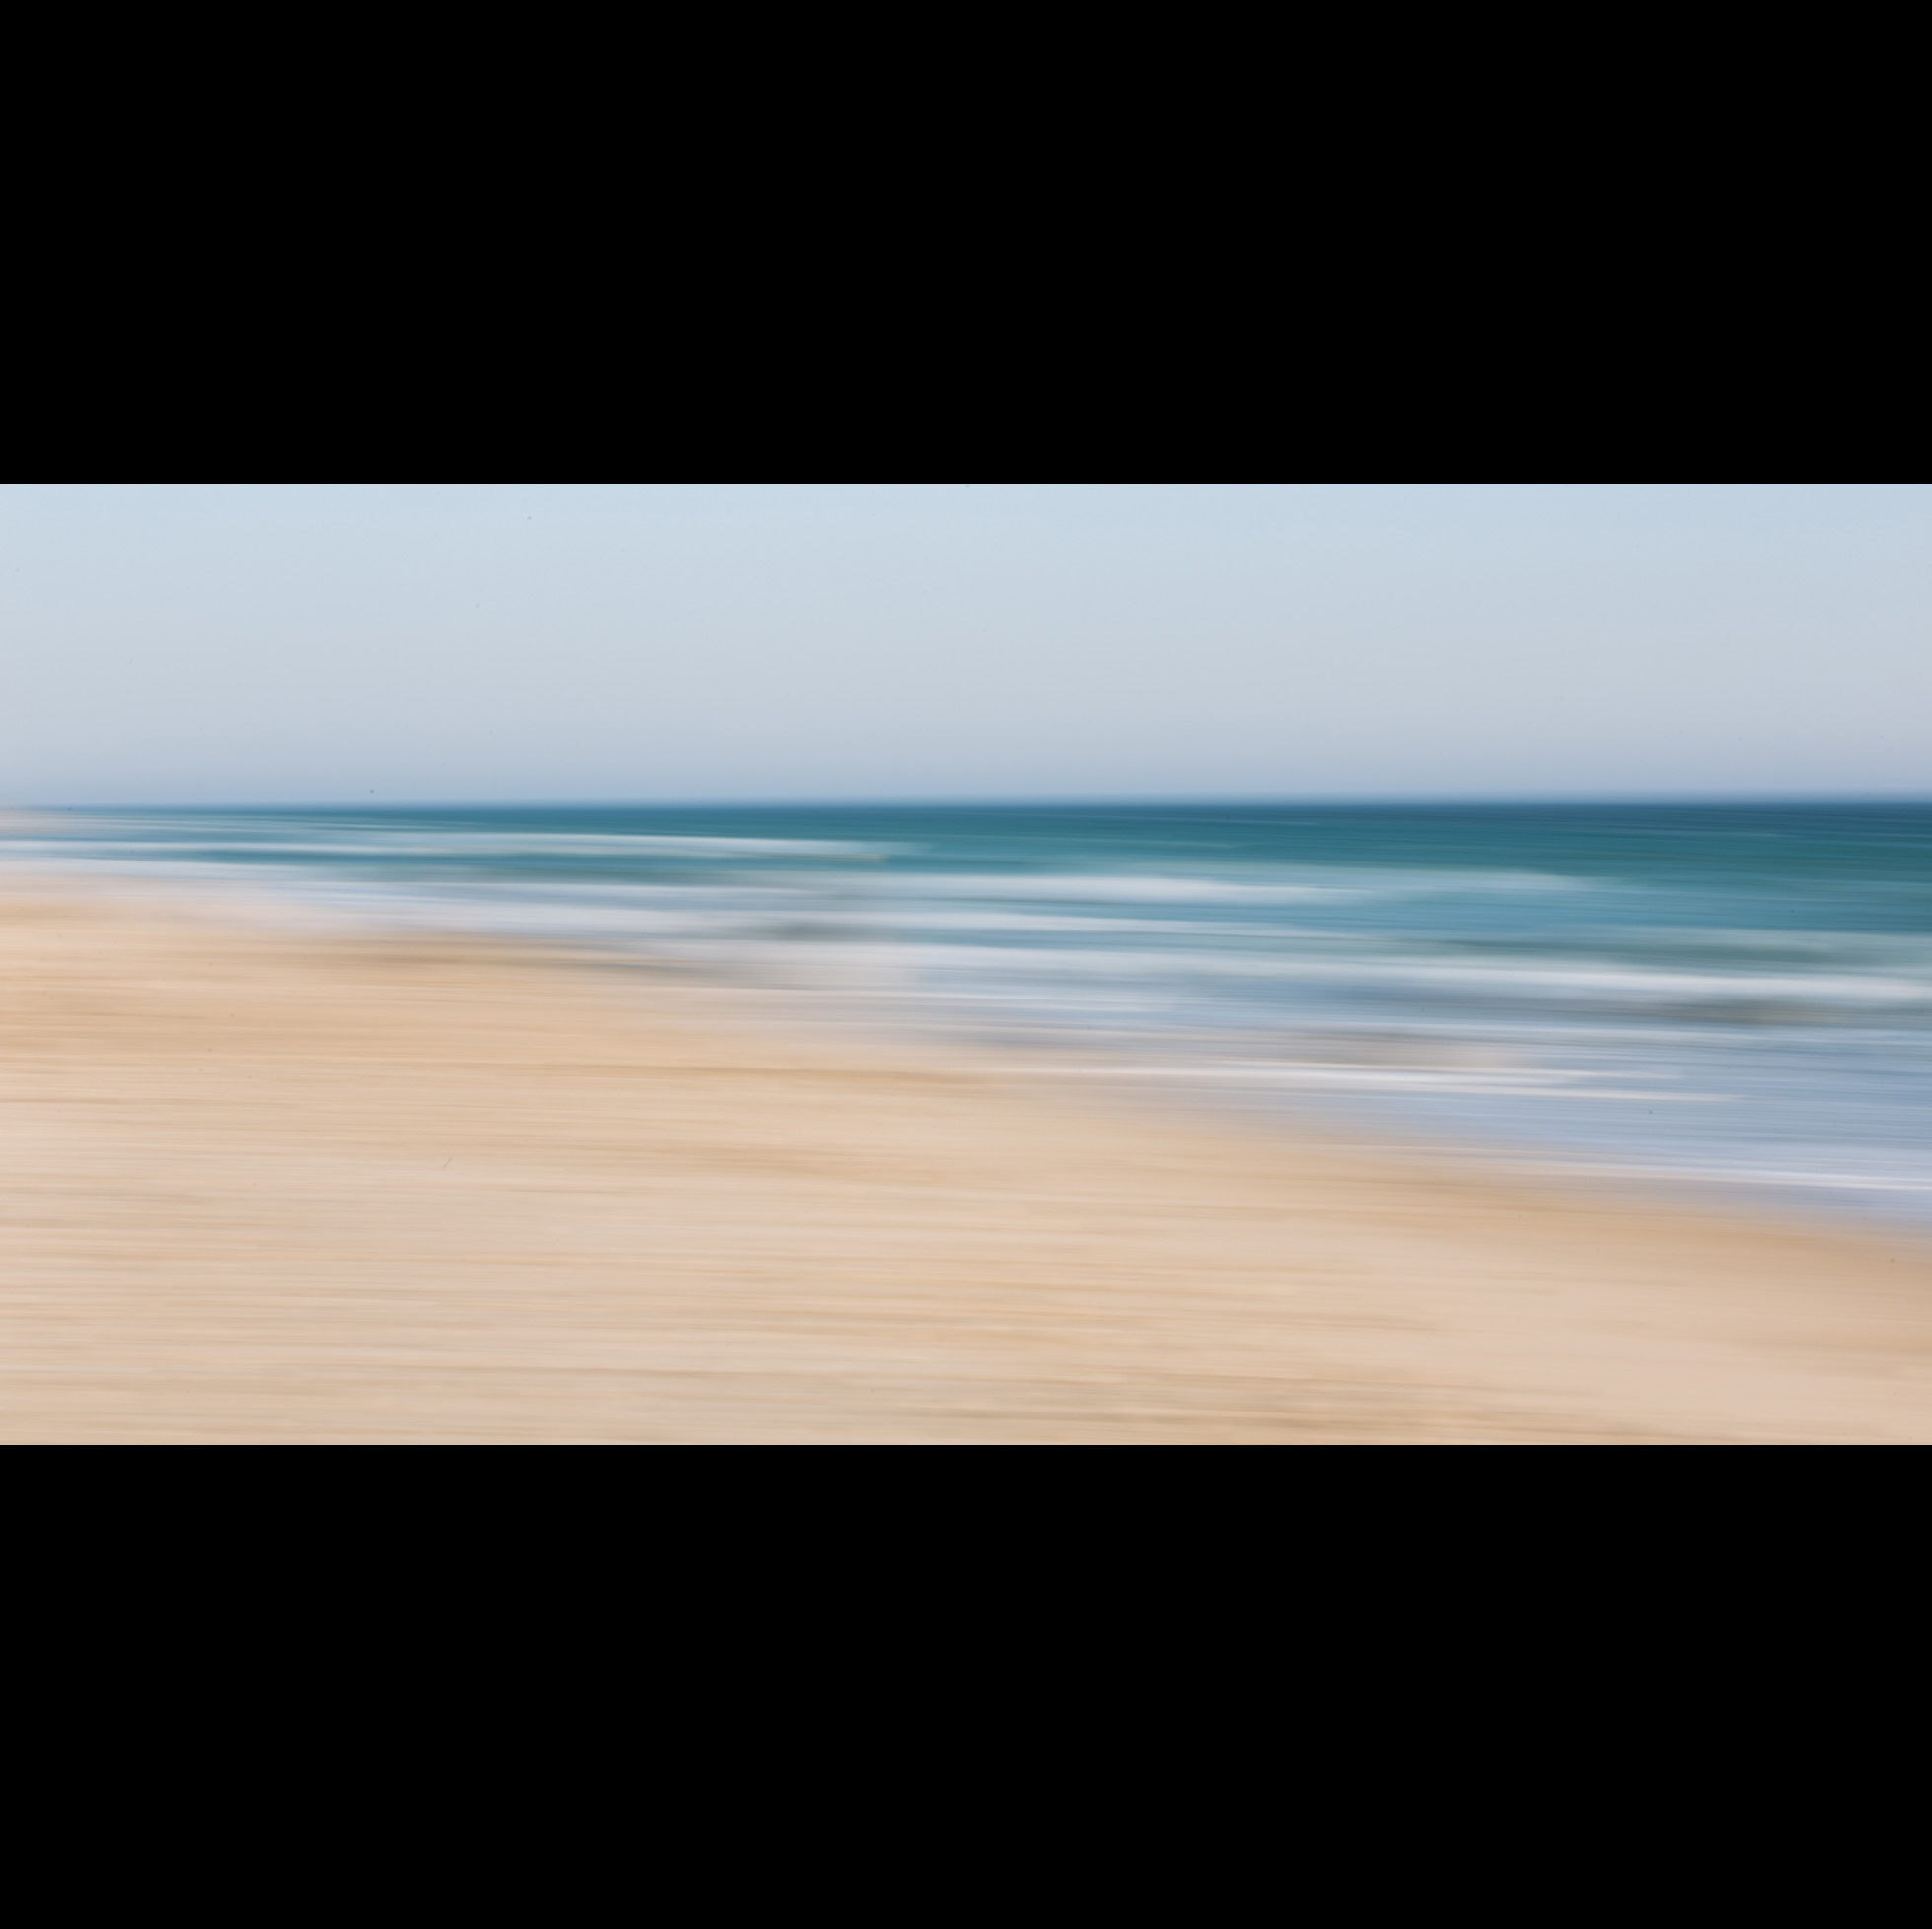 5.4 SLOW SURF